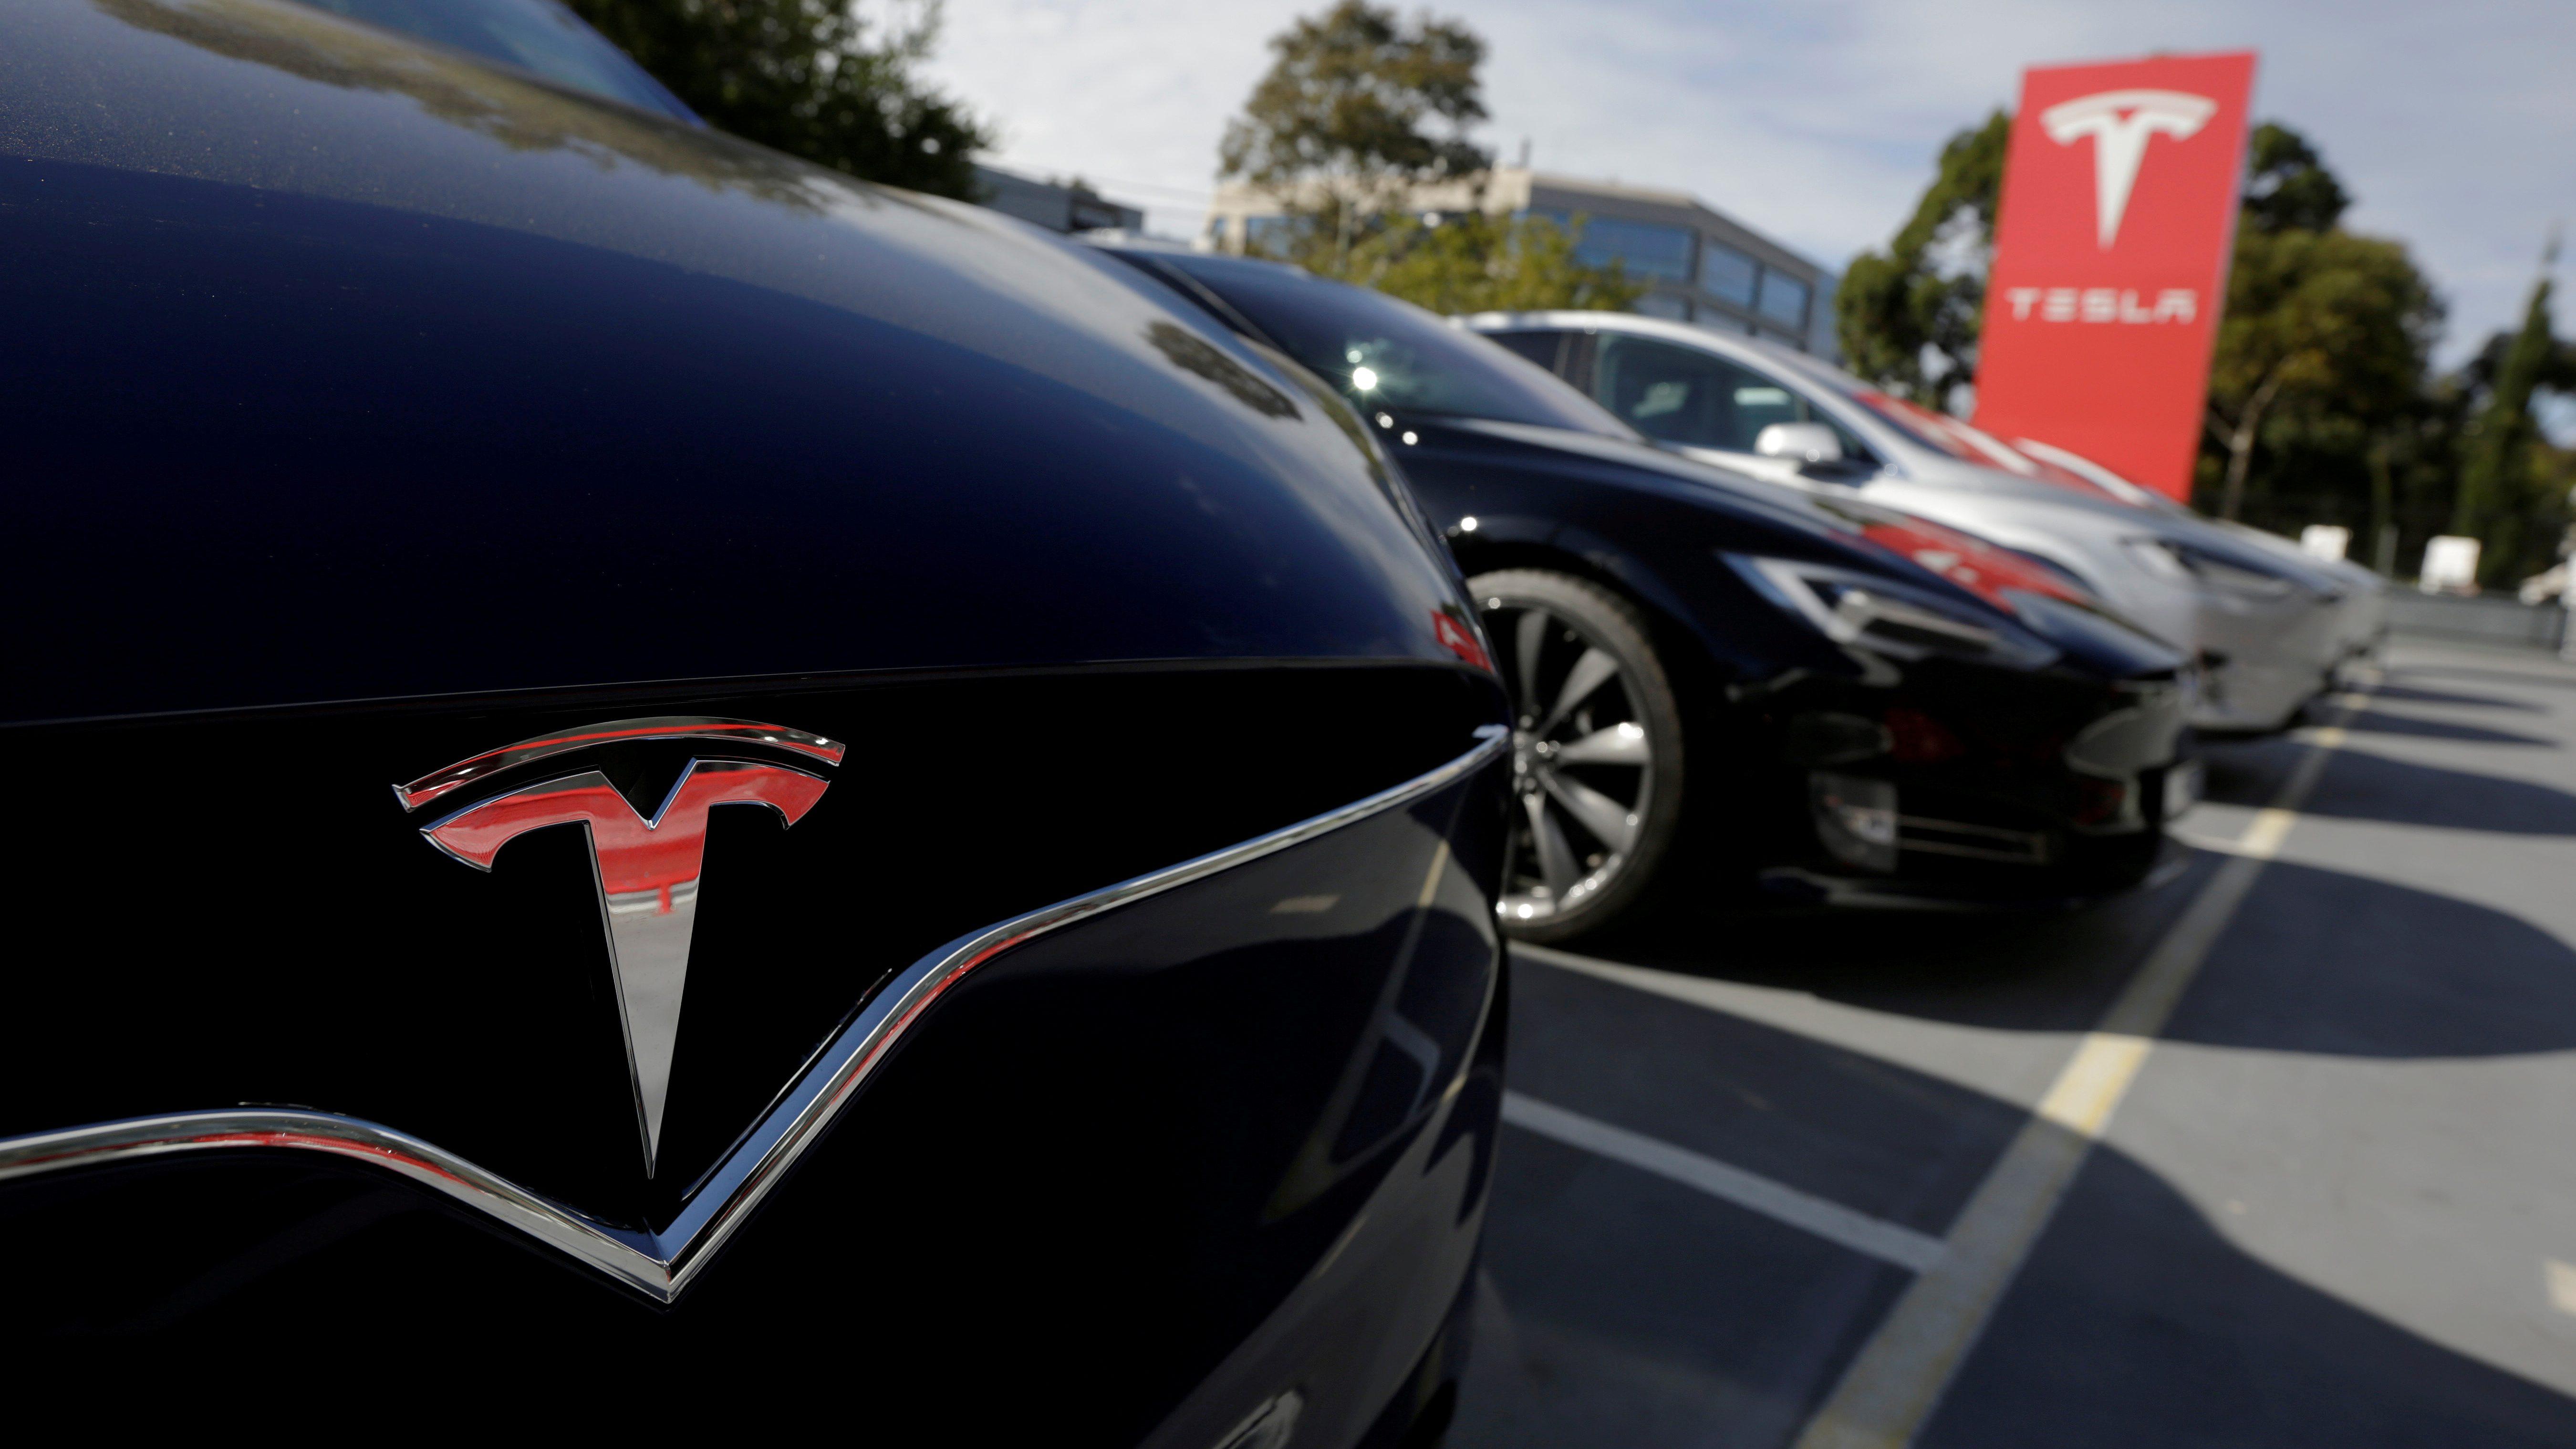 A Tesla Model X is photographed alongside a Model S at a Tesla electric car dealership in Sydney